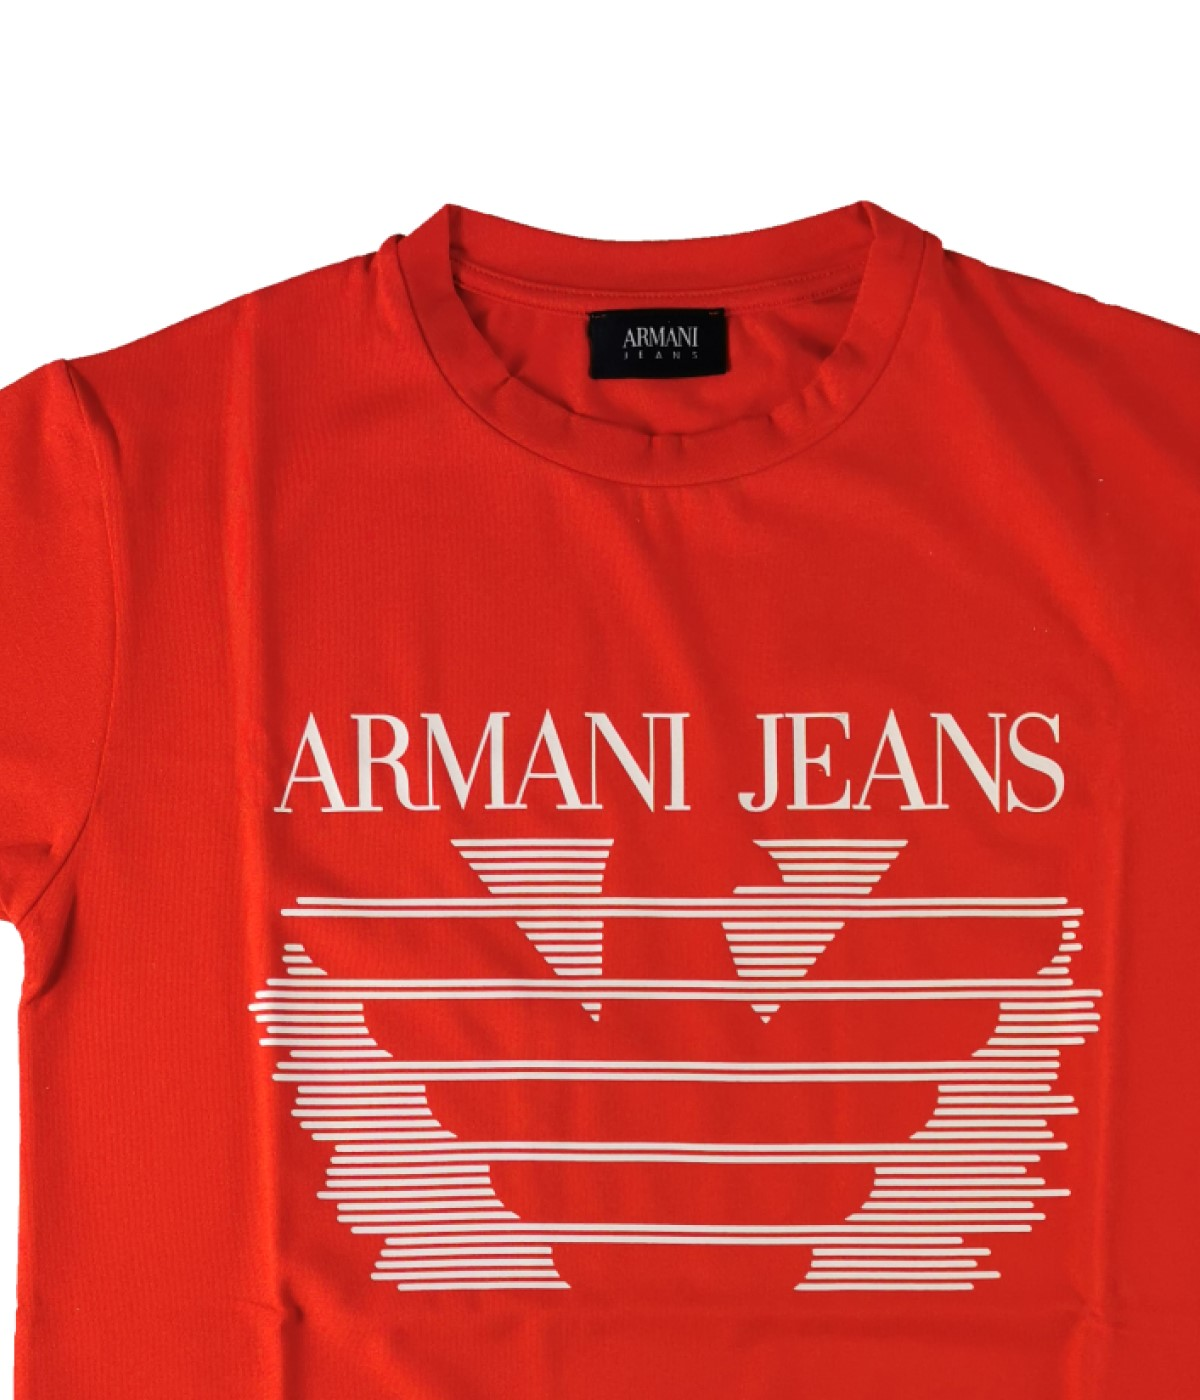 ARMANI JEANS T-SHIRT UOMO ROSSA LOGO STAMPATO 3